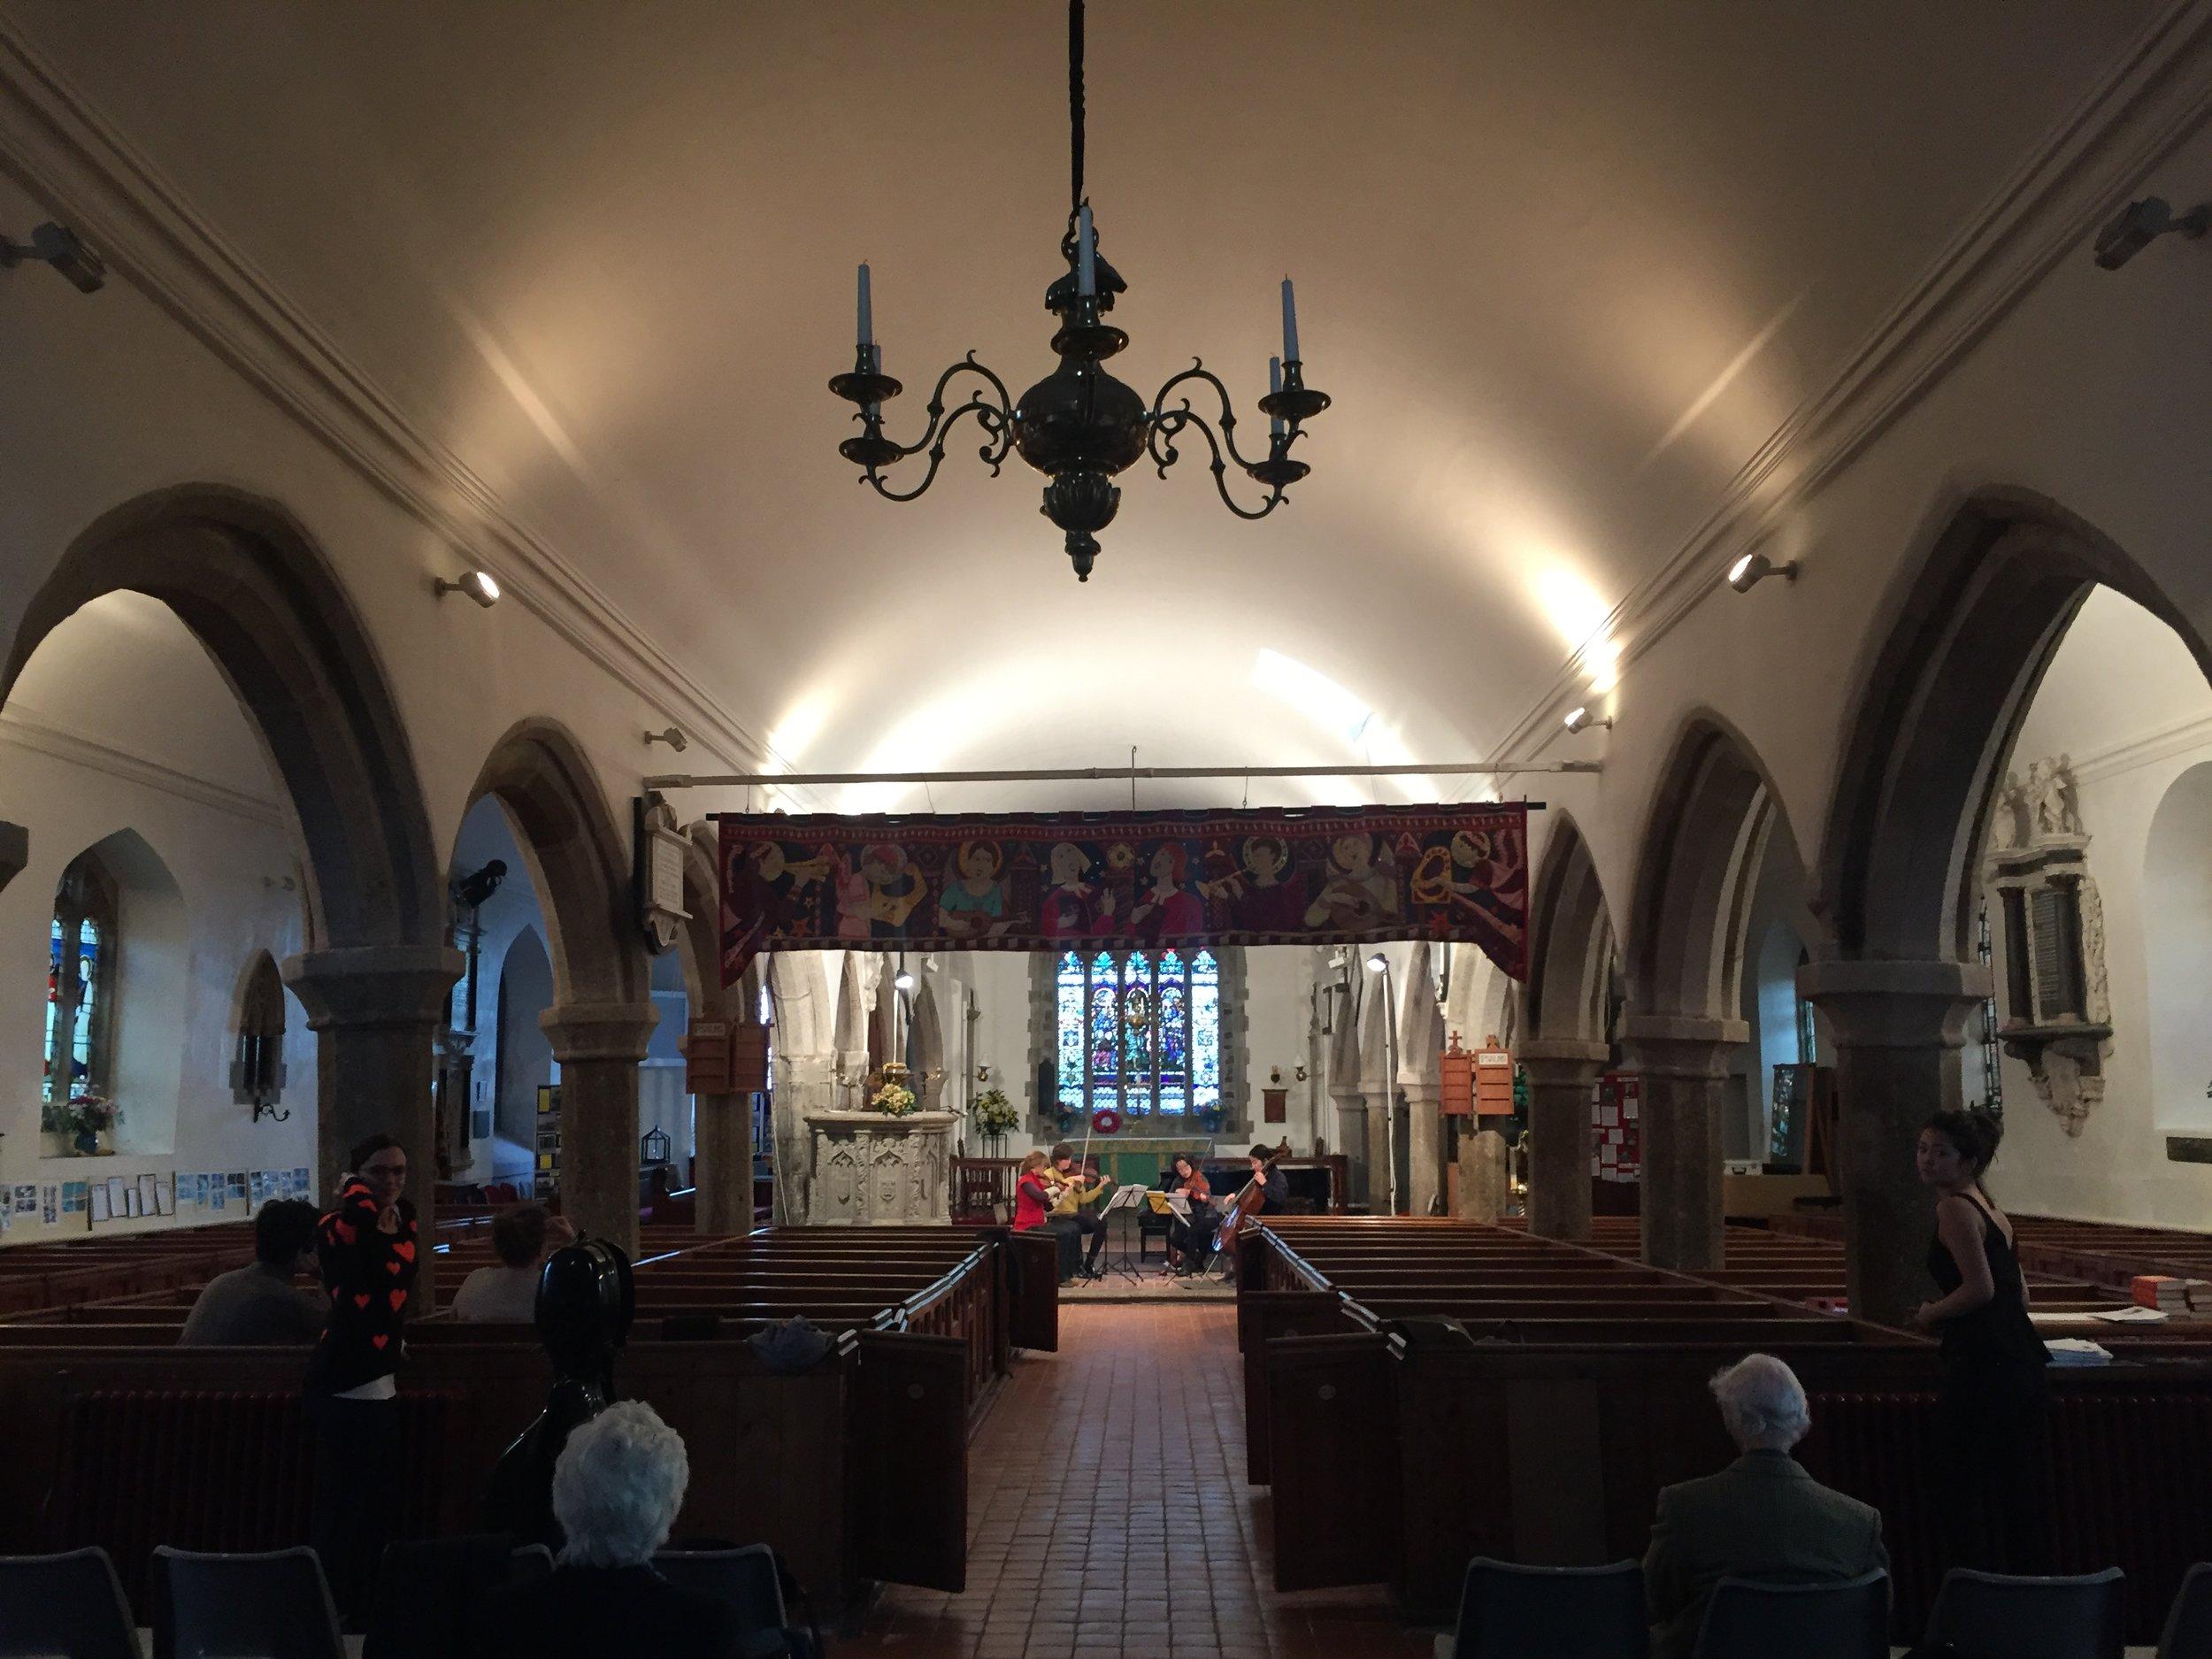 Schumann Quintet in this church at OCM